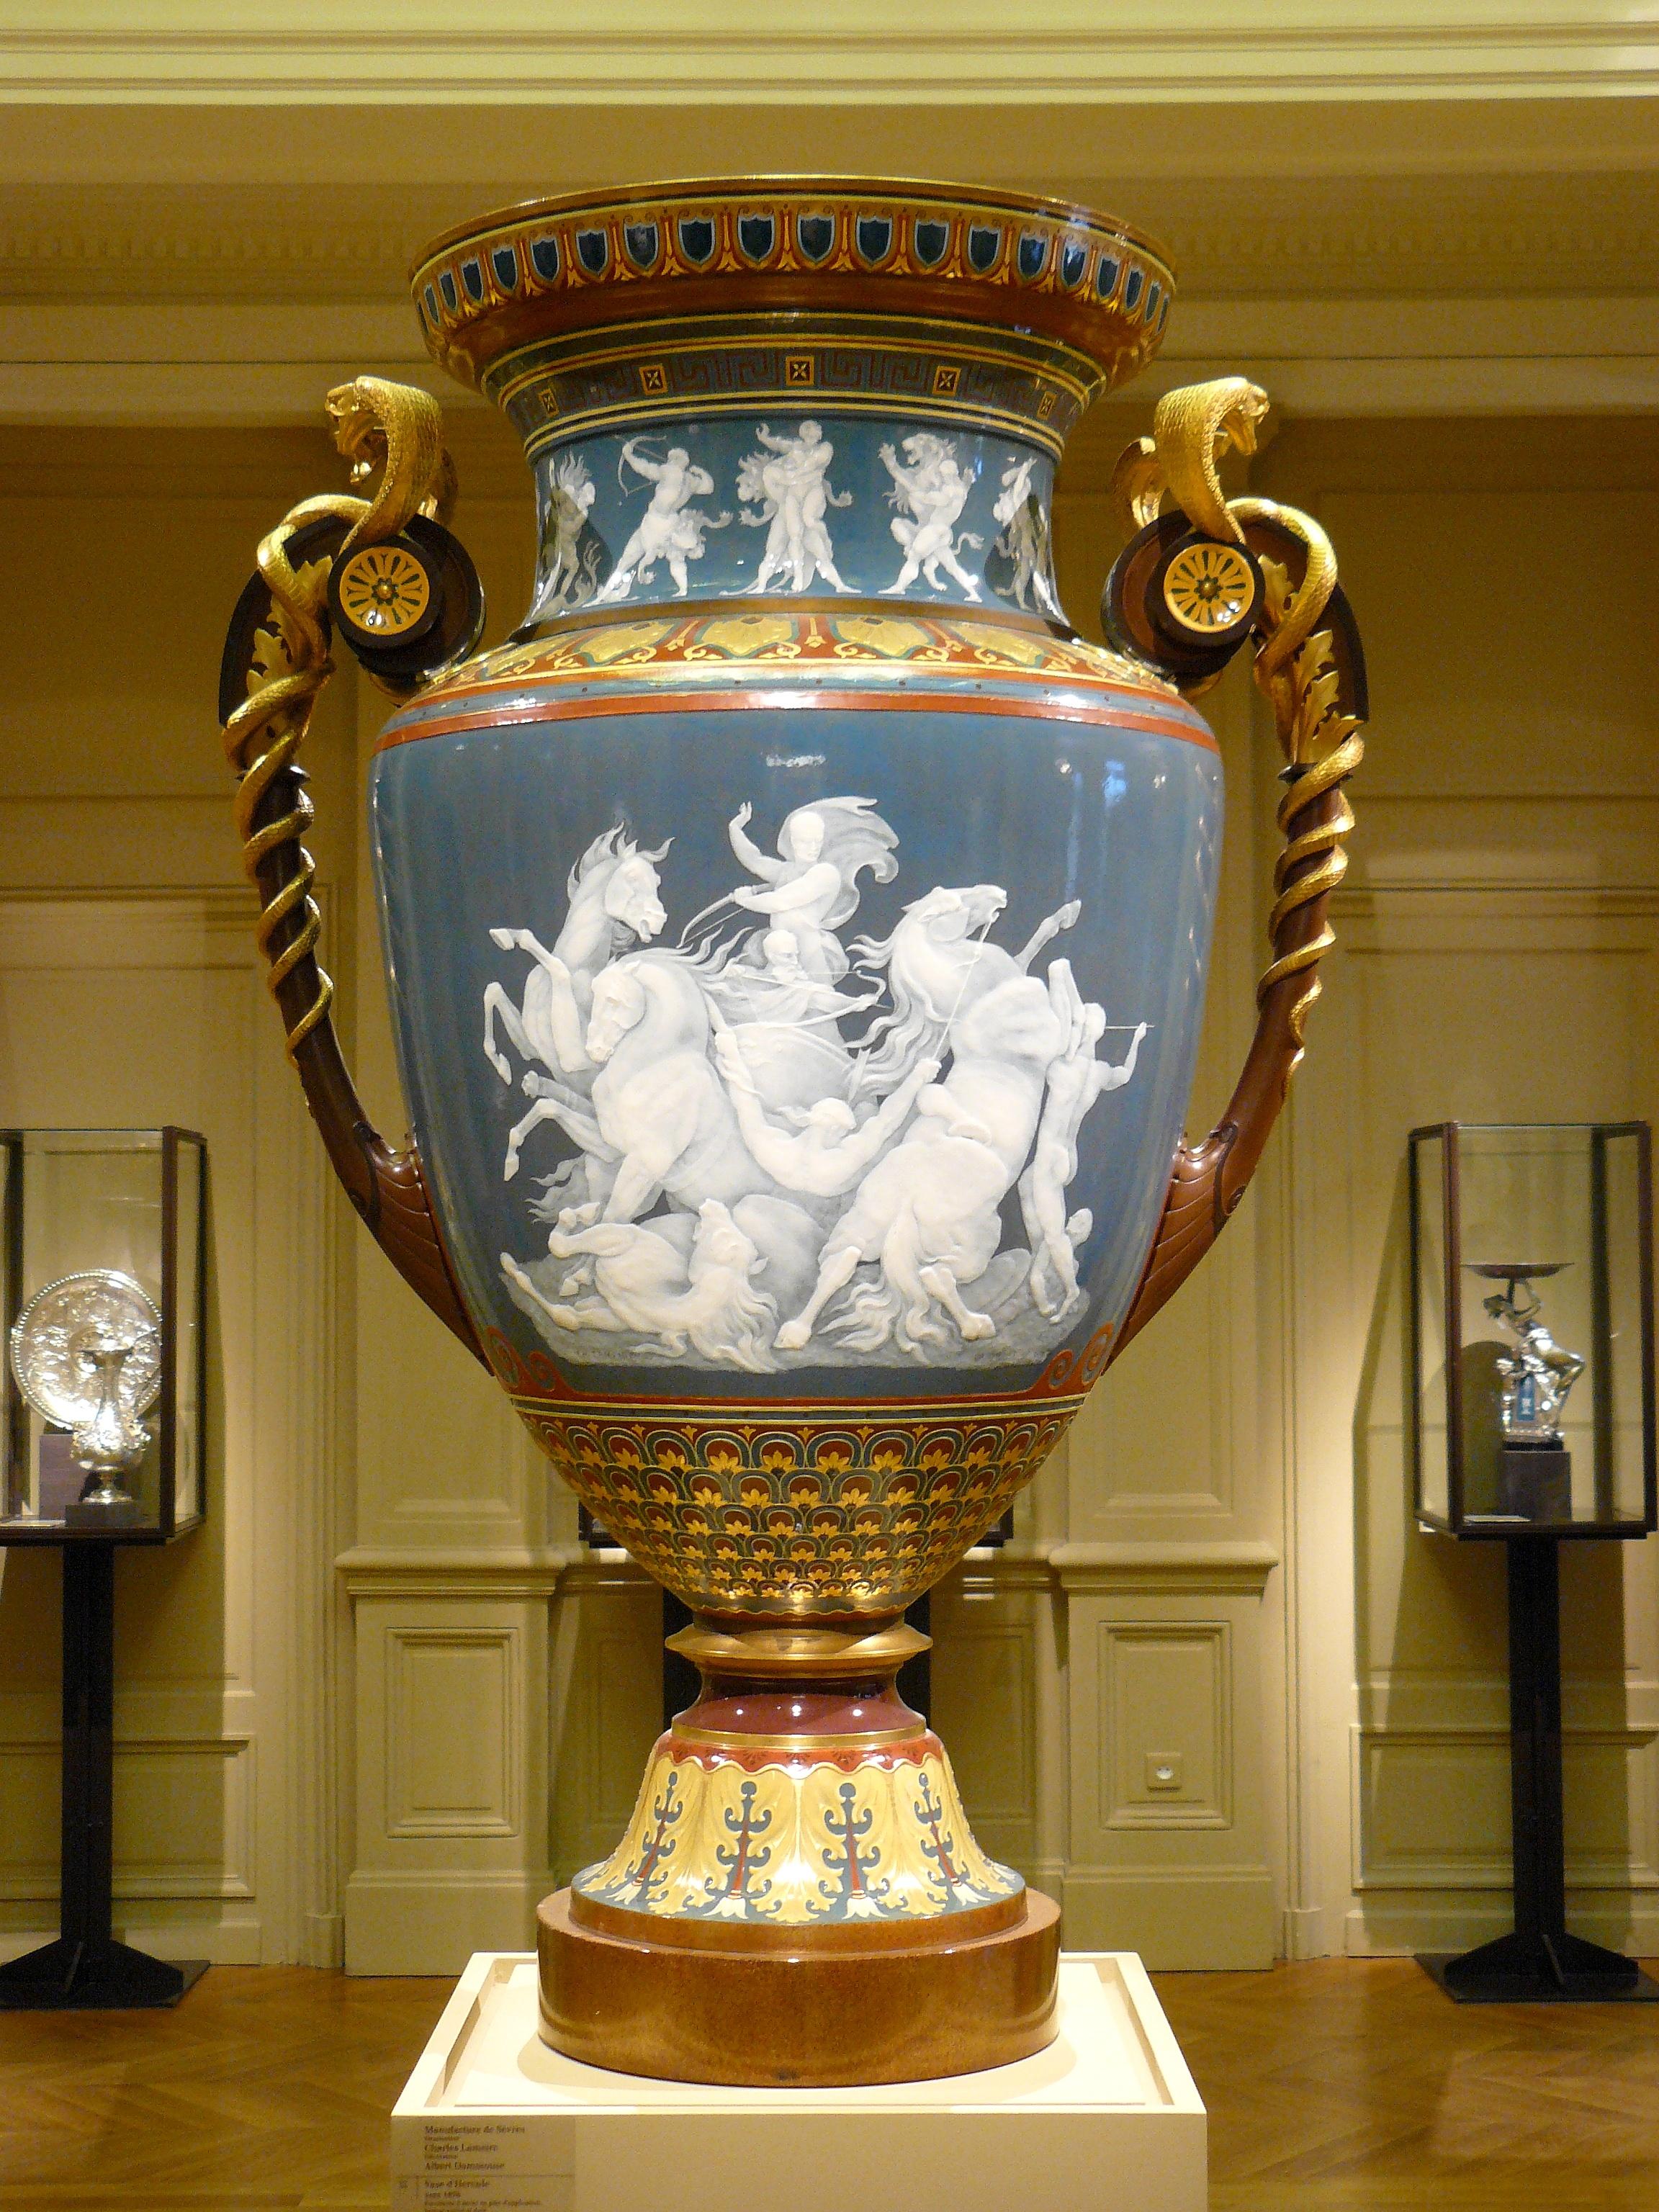 https://upload.wikimedia.org/wikipedia/commons/0/08/Vase_d%27Hercule_S%C3%A8vres_Orsay.jpg